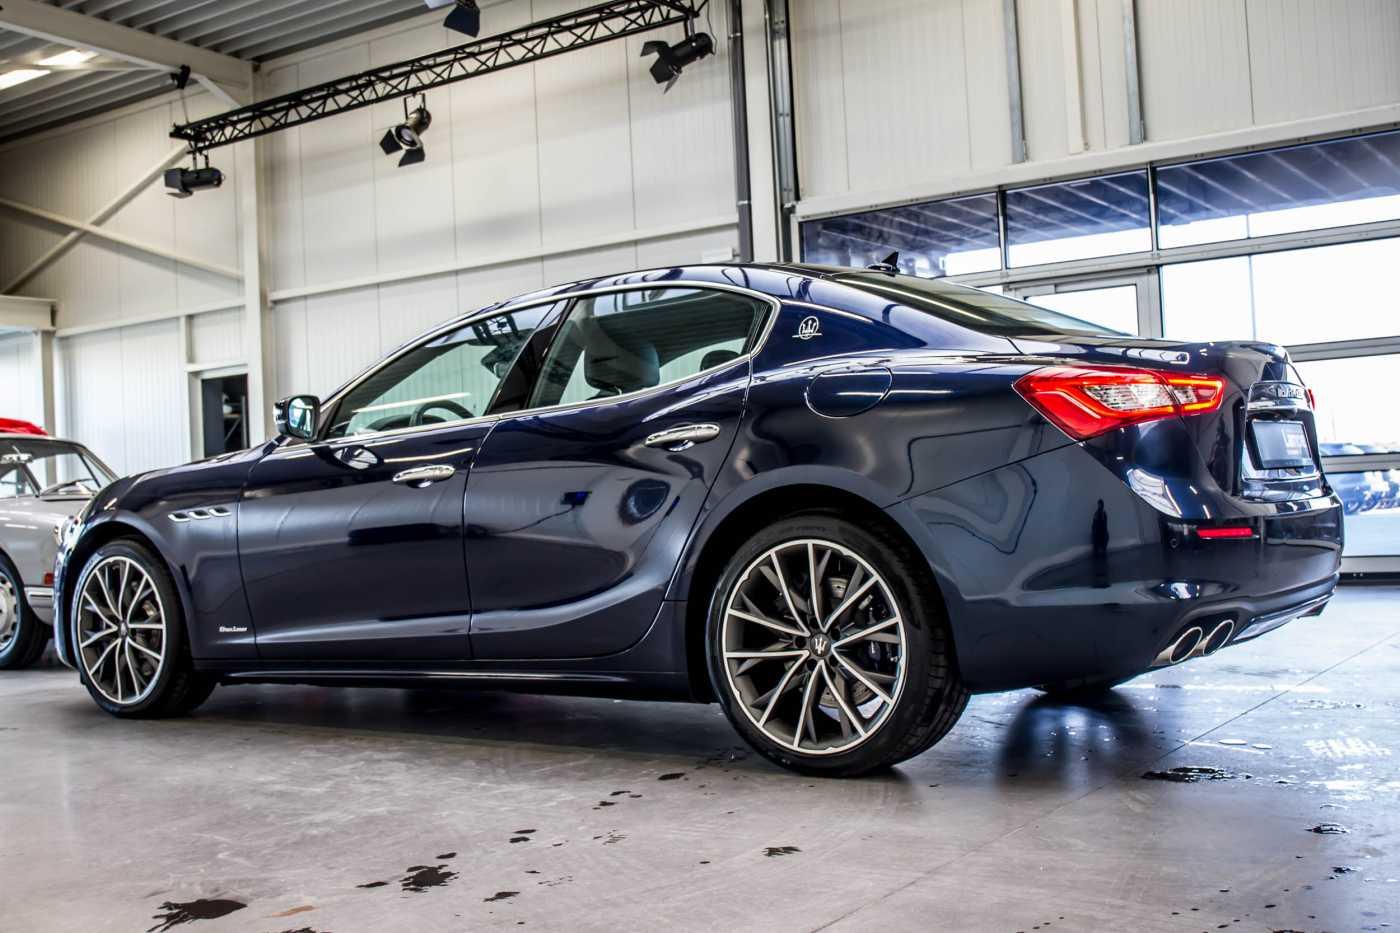 Maserati Ghibli Diesel GranLusso Keyless Sports Exhaust LED Camera 4/29